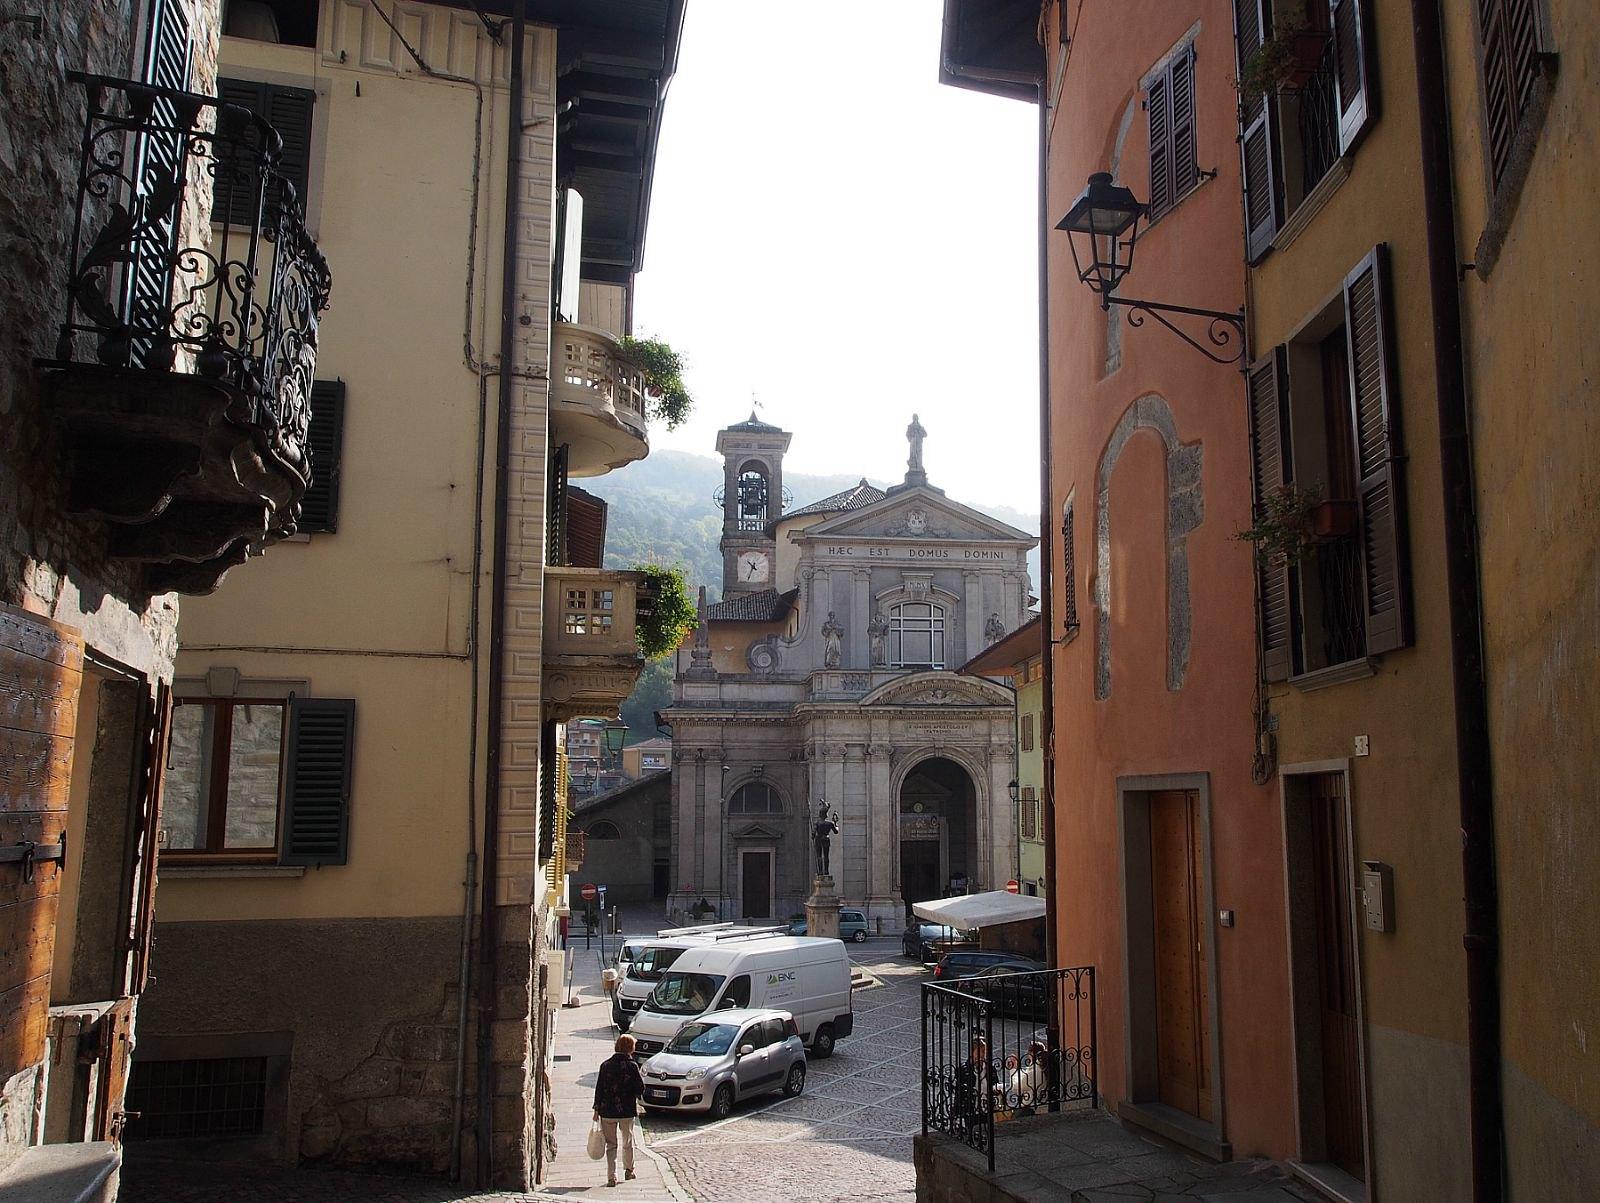 San Giovanni Bianco